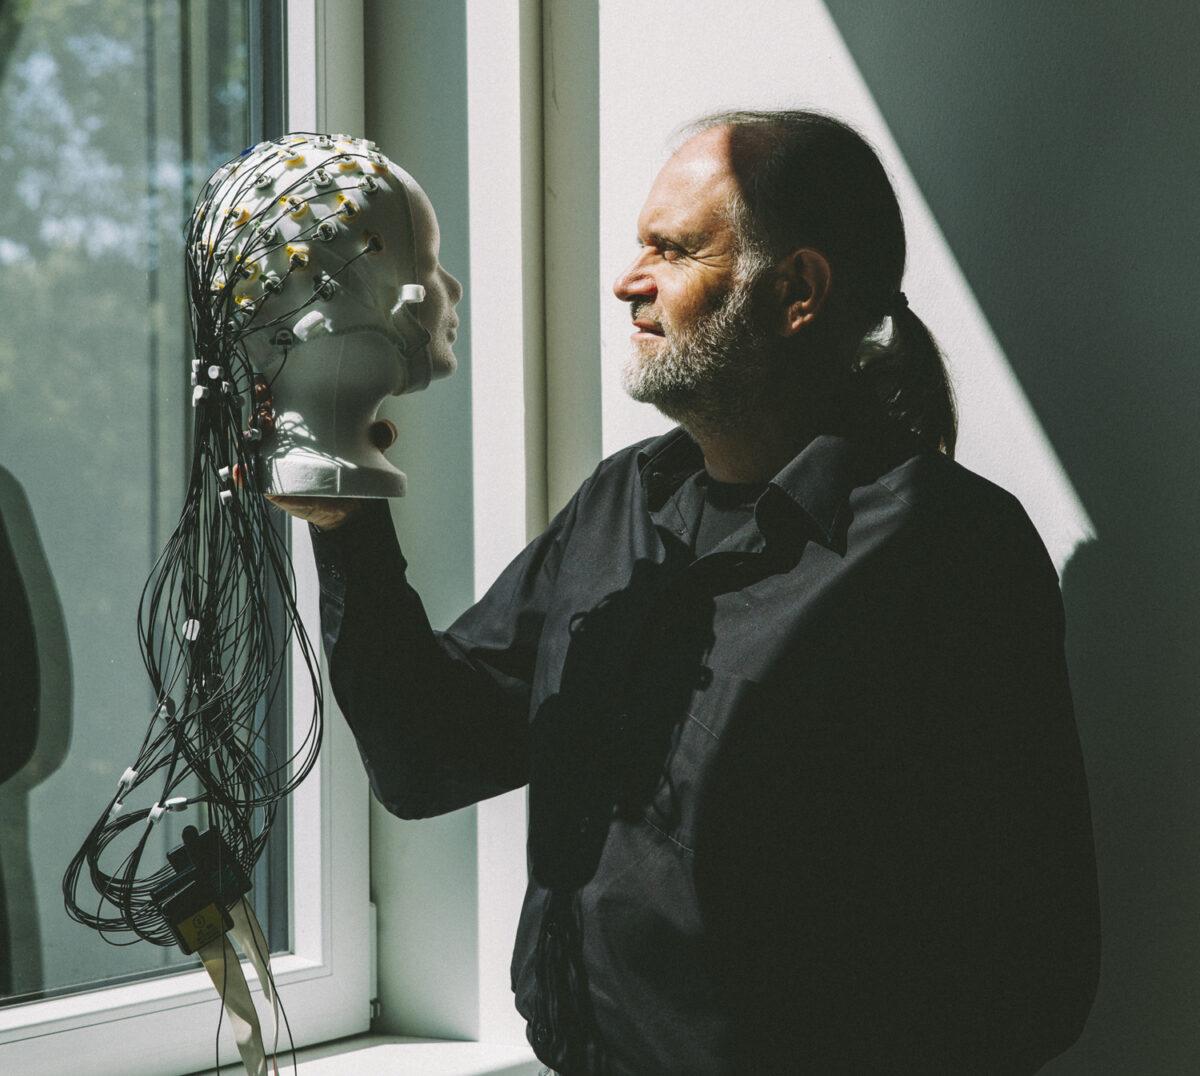 Stephan Getzmann mit EEG Kappe